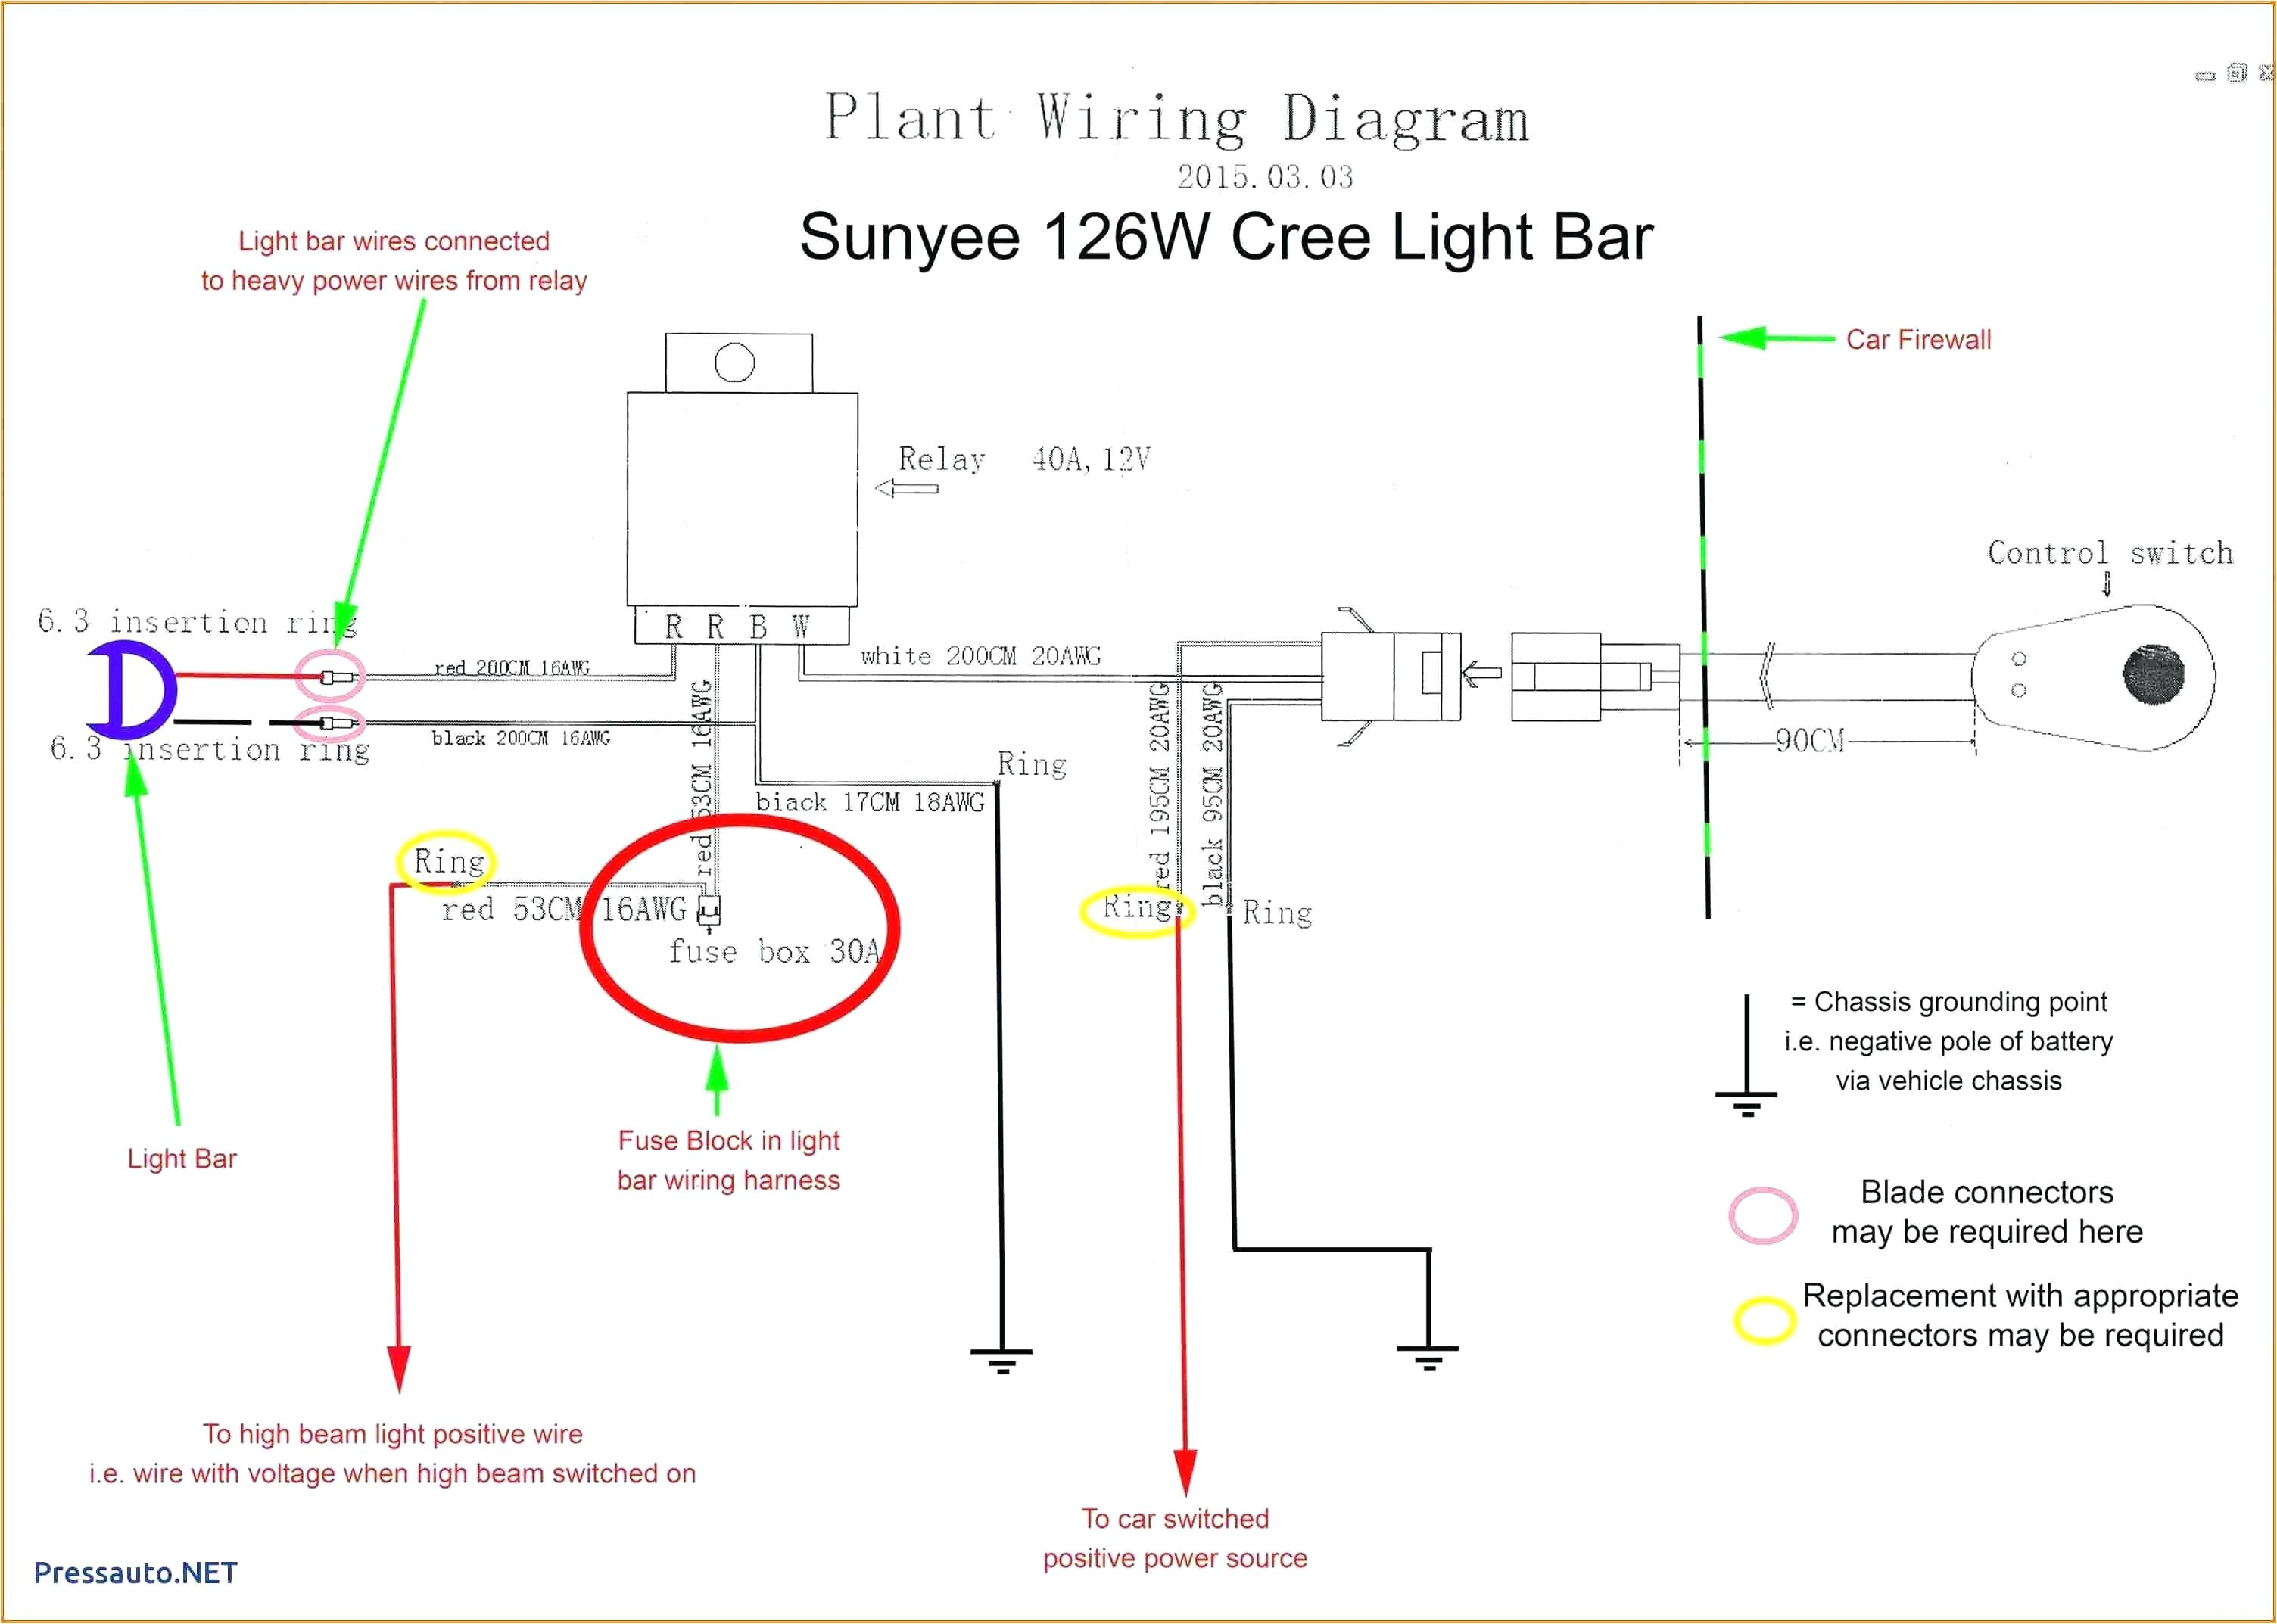 tortoise point motor wiring diagram new mcdonnell miller low water cutoff wiring diagram valid 3 way